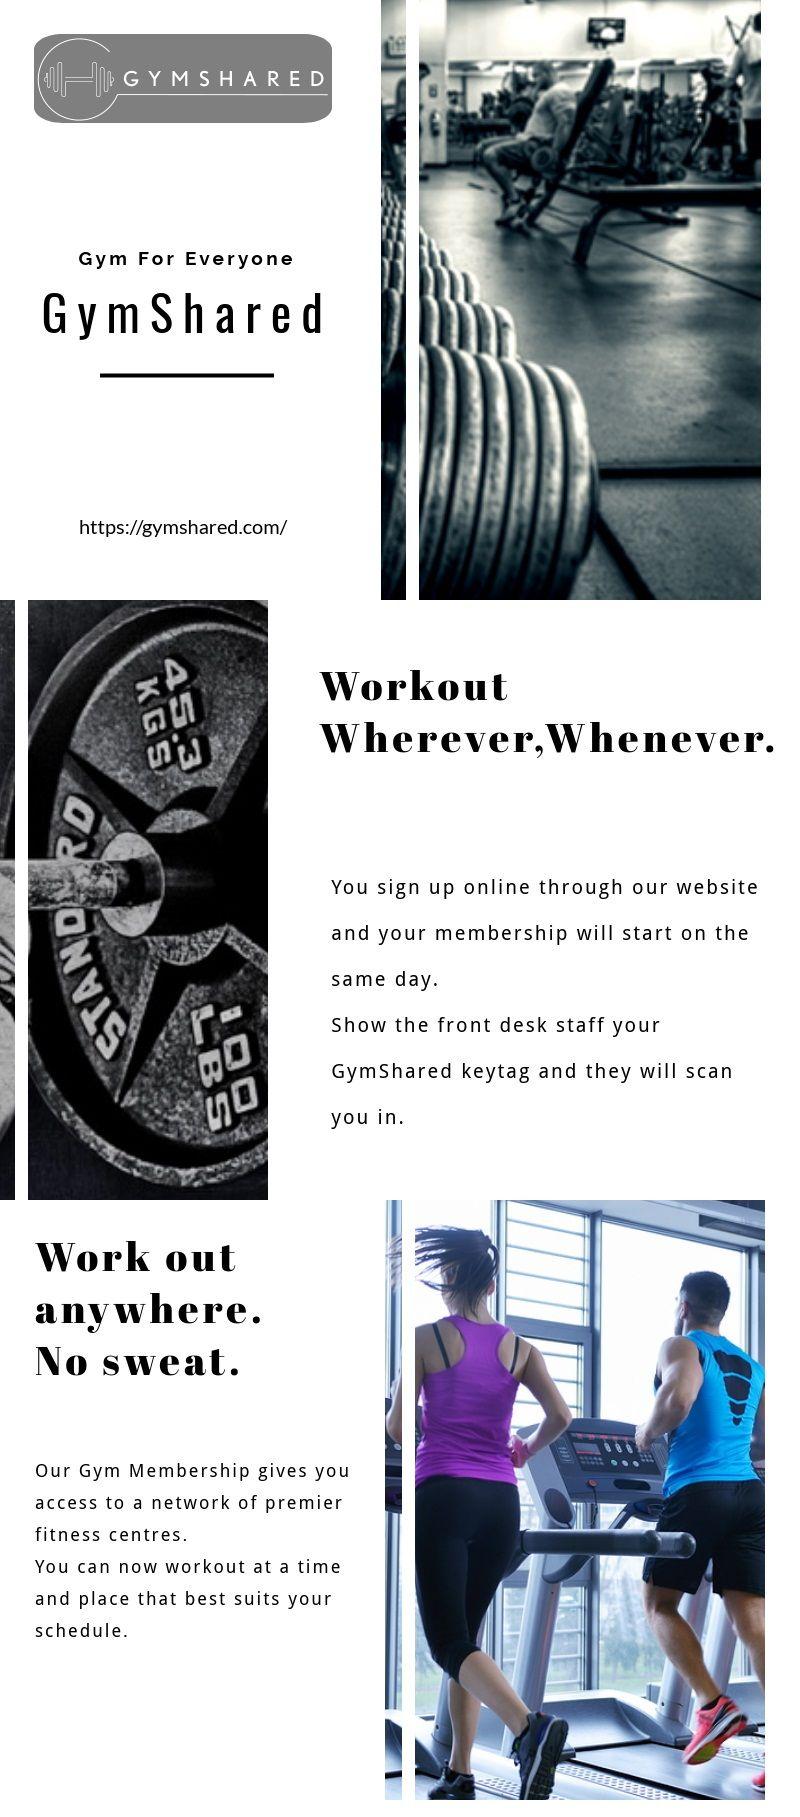 Gym Membership Gym membership, Gym, Register online